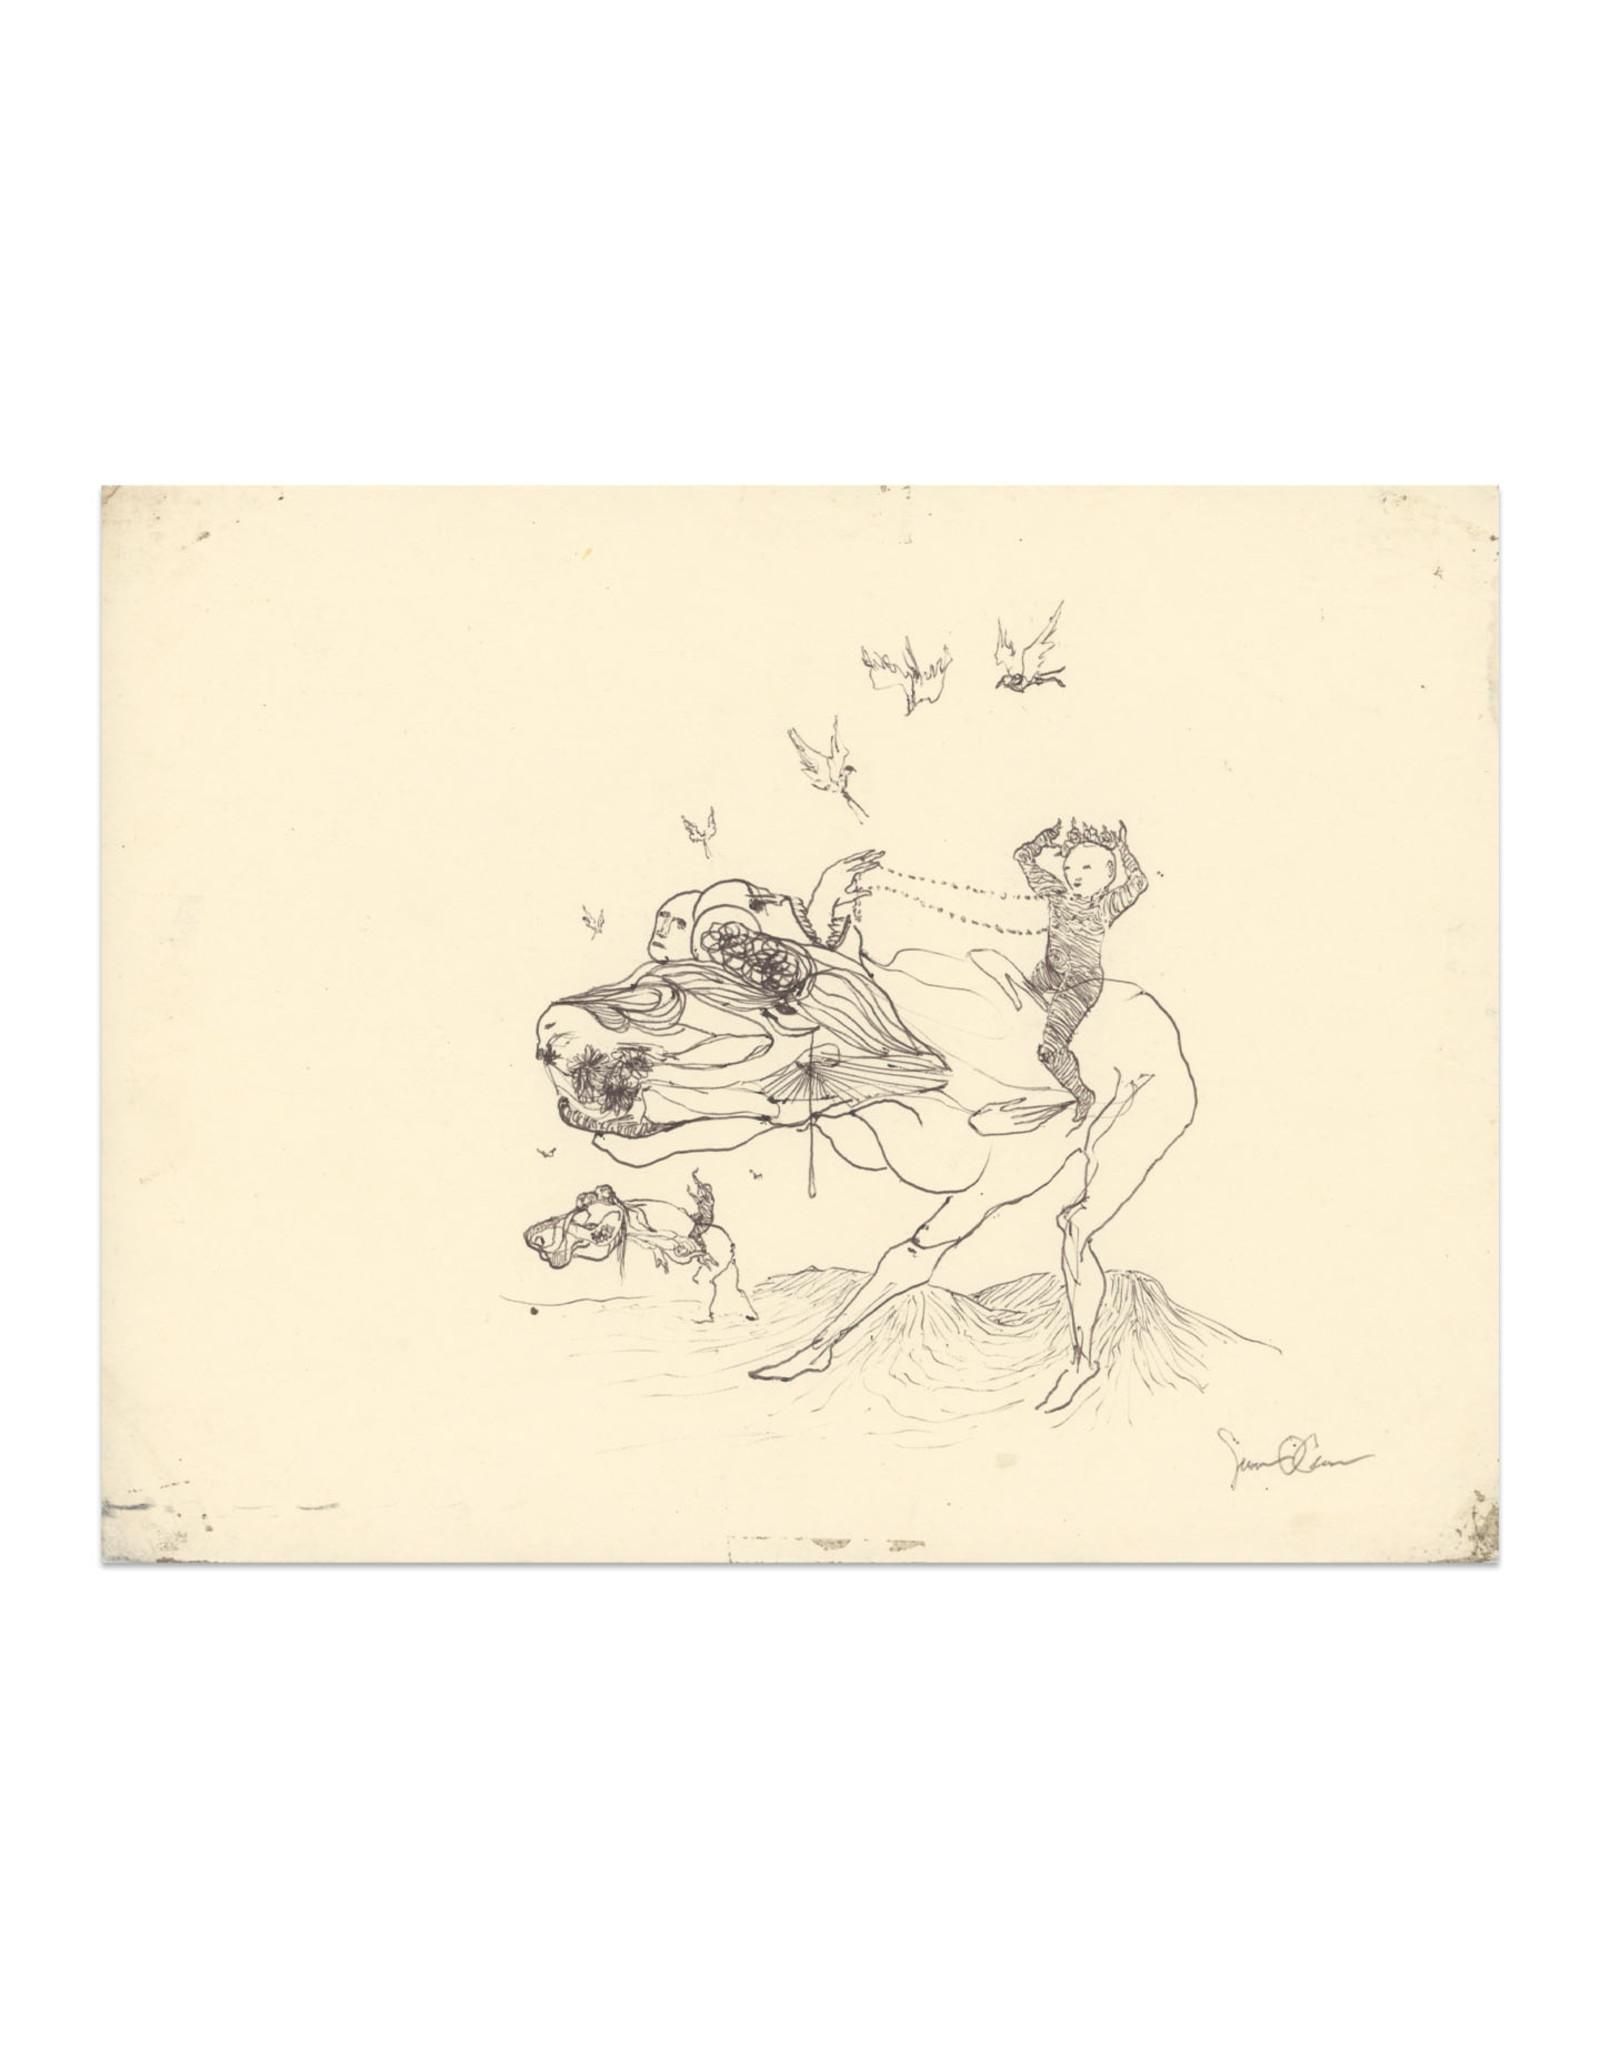 Senan O'Connor Sketchbook Original Drawing No. 1